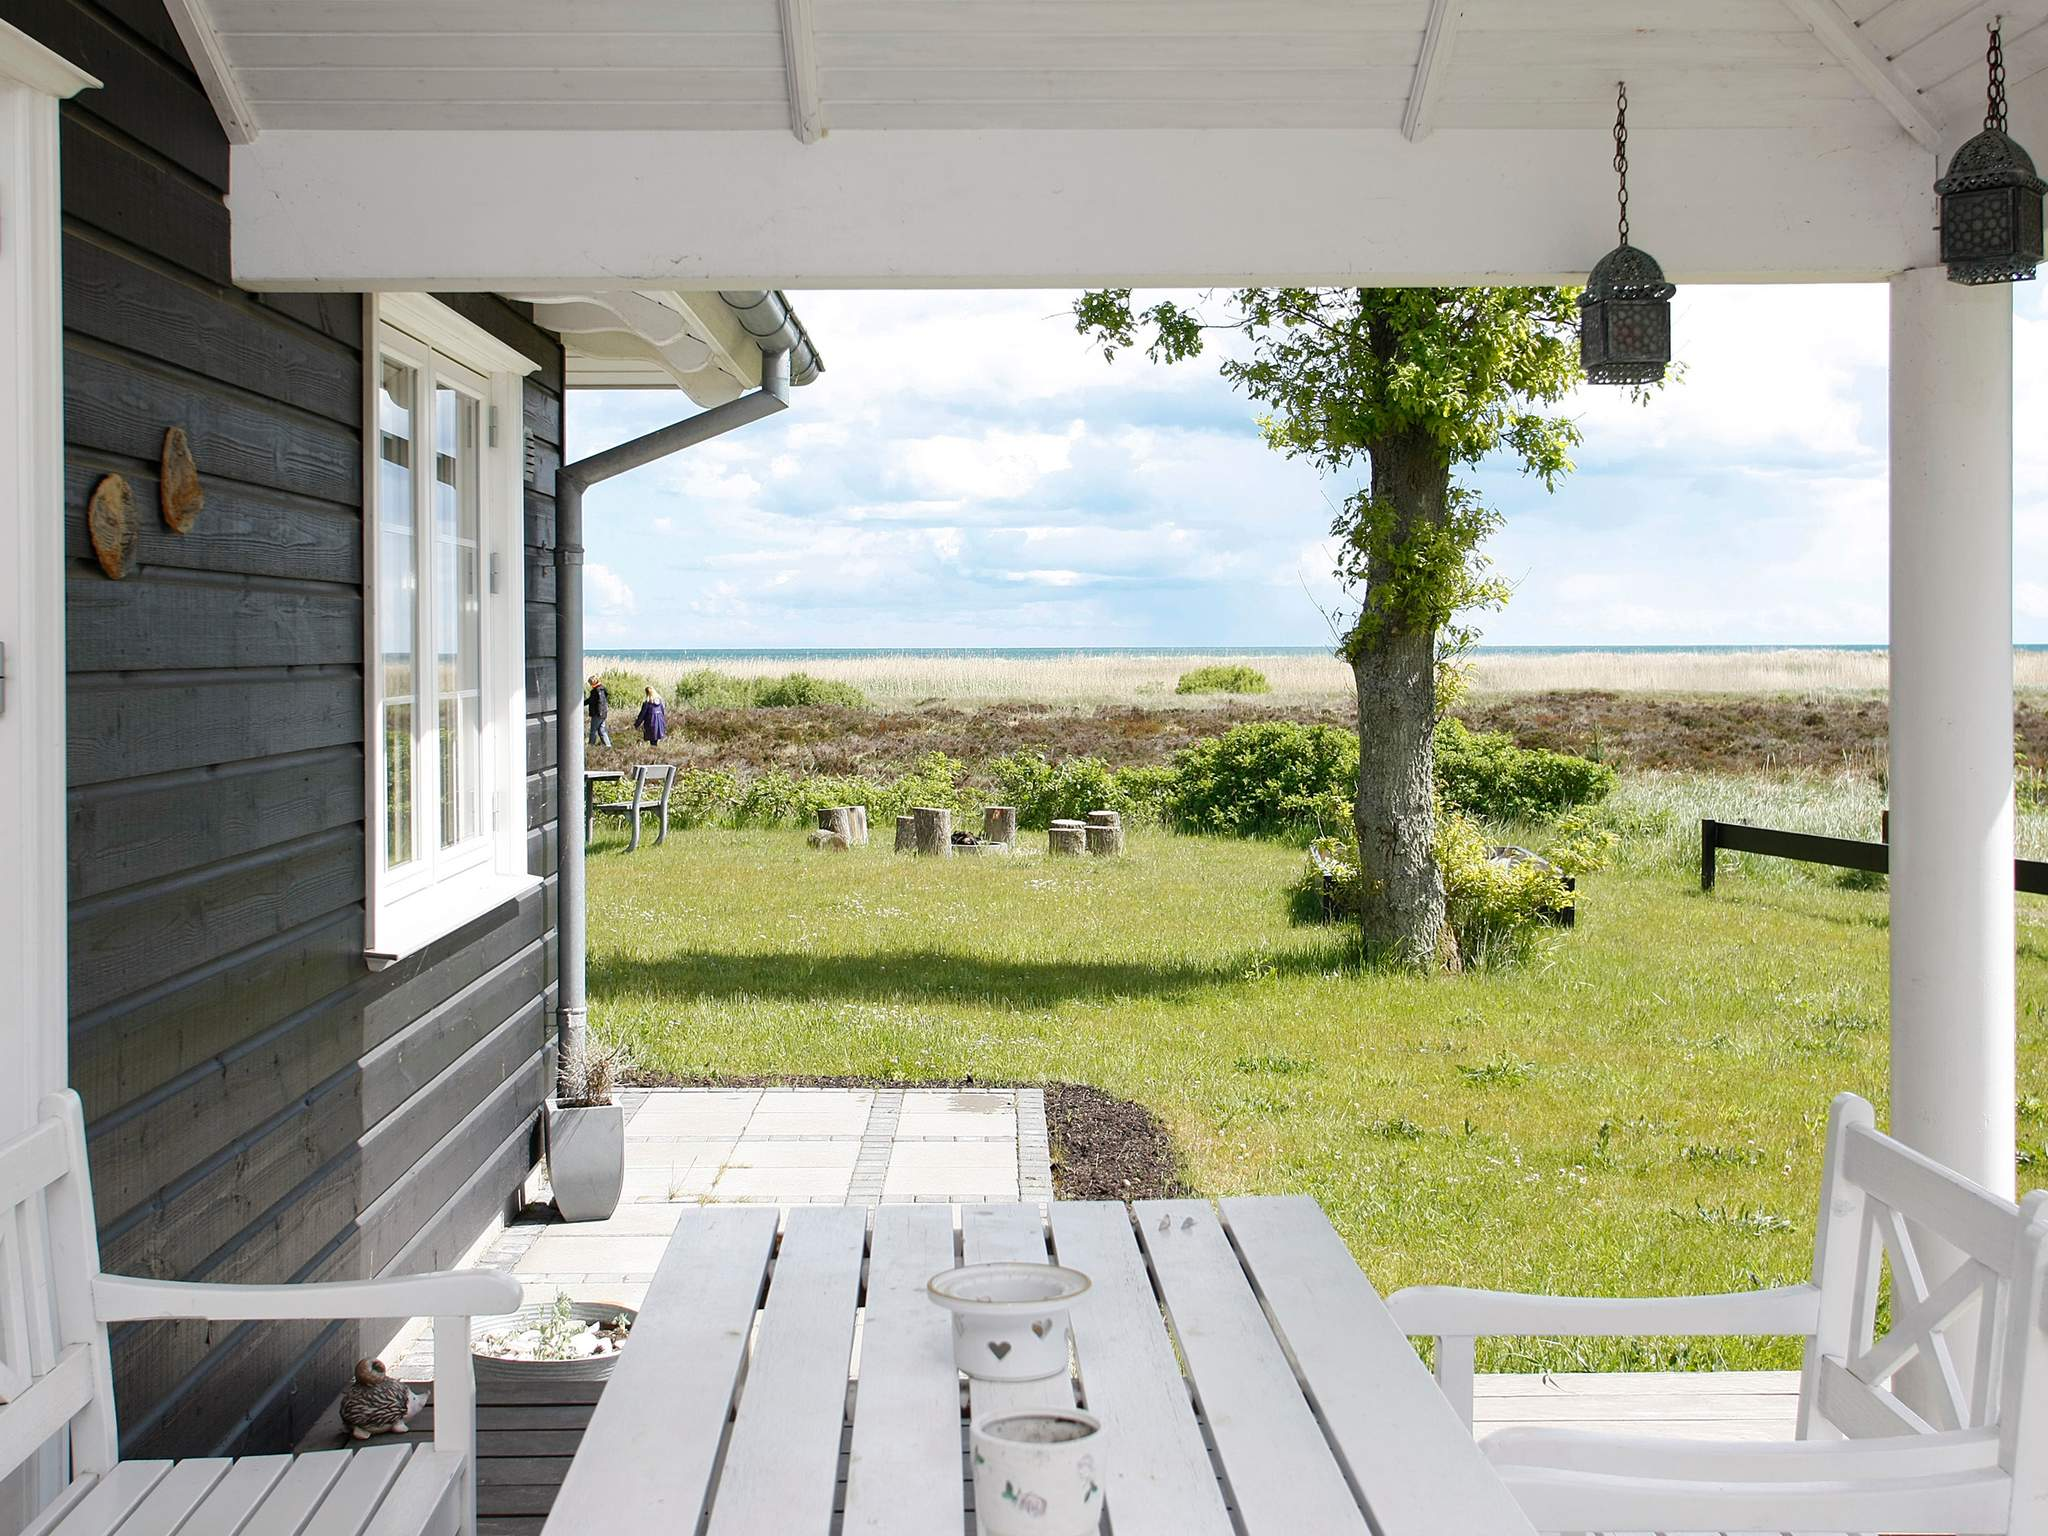 Ferienhaus Hou/Lagunen (317346), Hou, , Dänische Ostsee, Dänemark, Bild 37